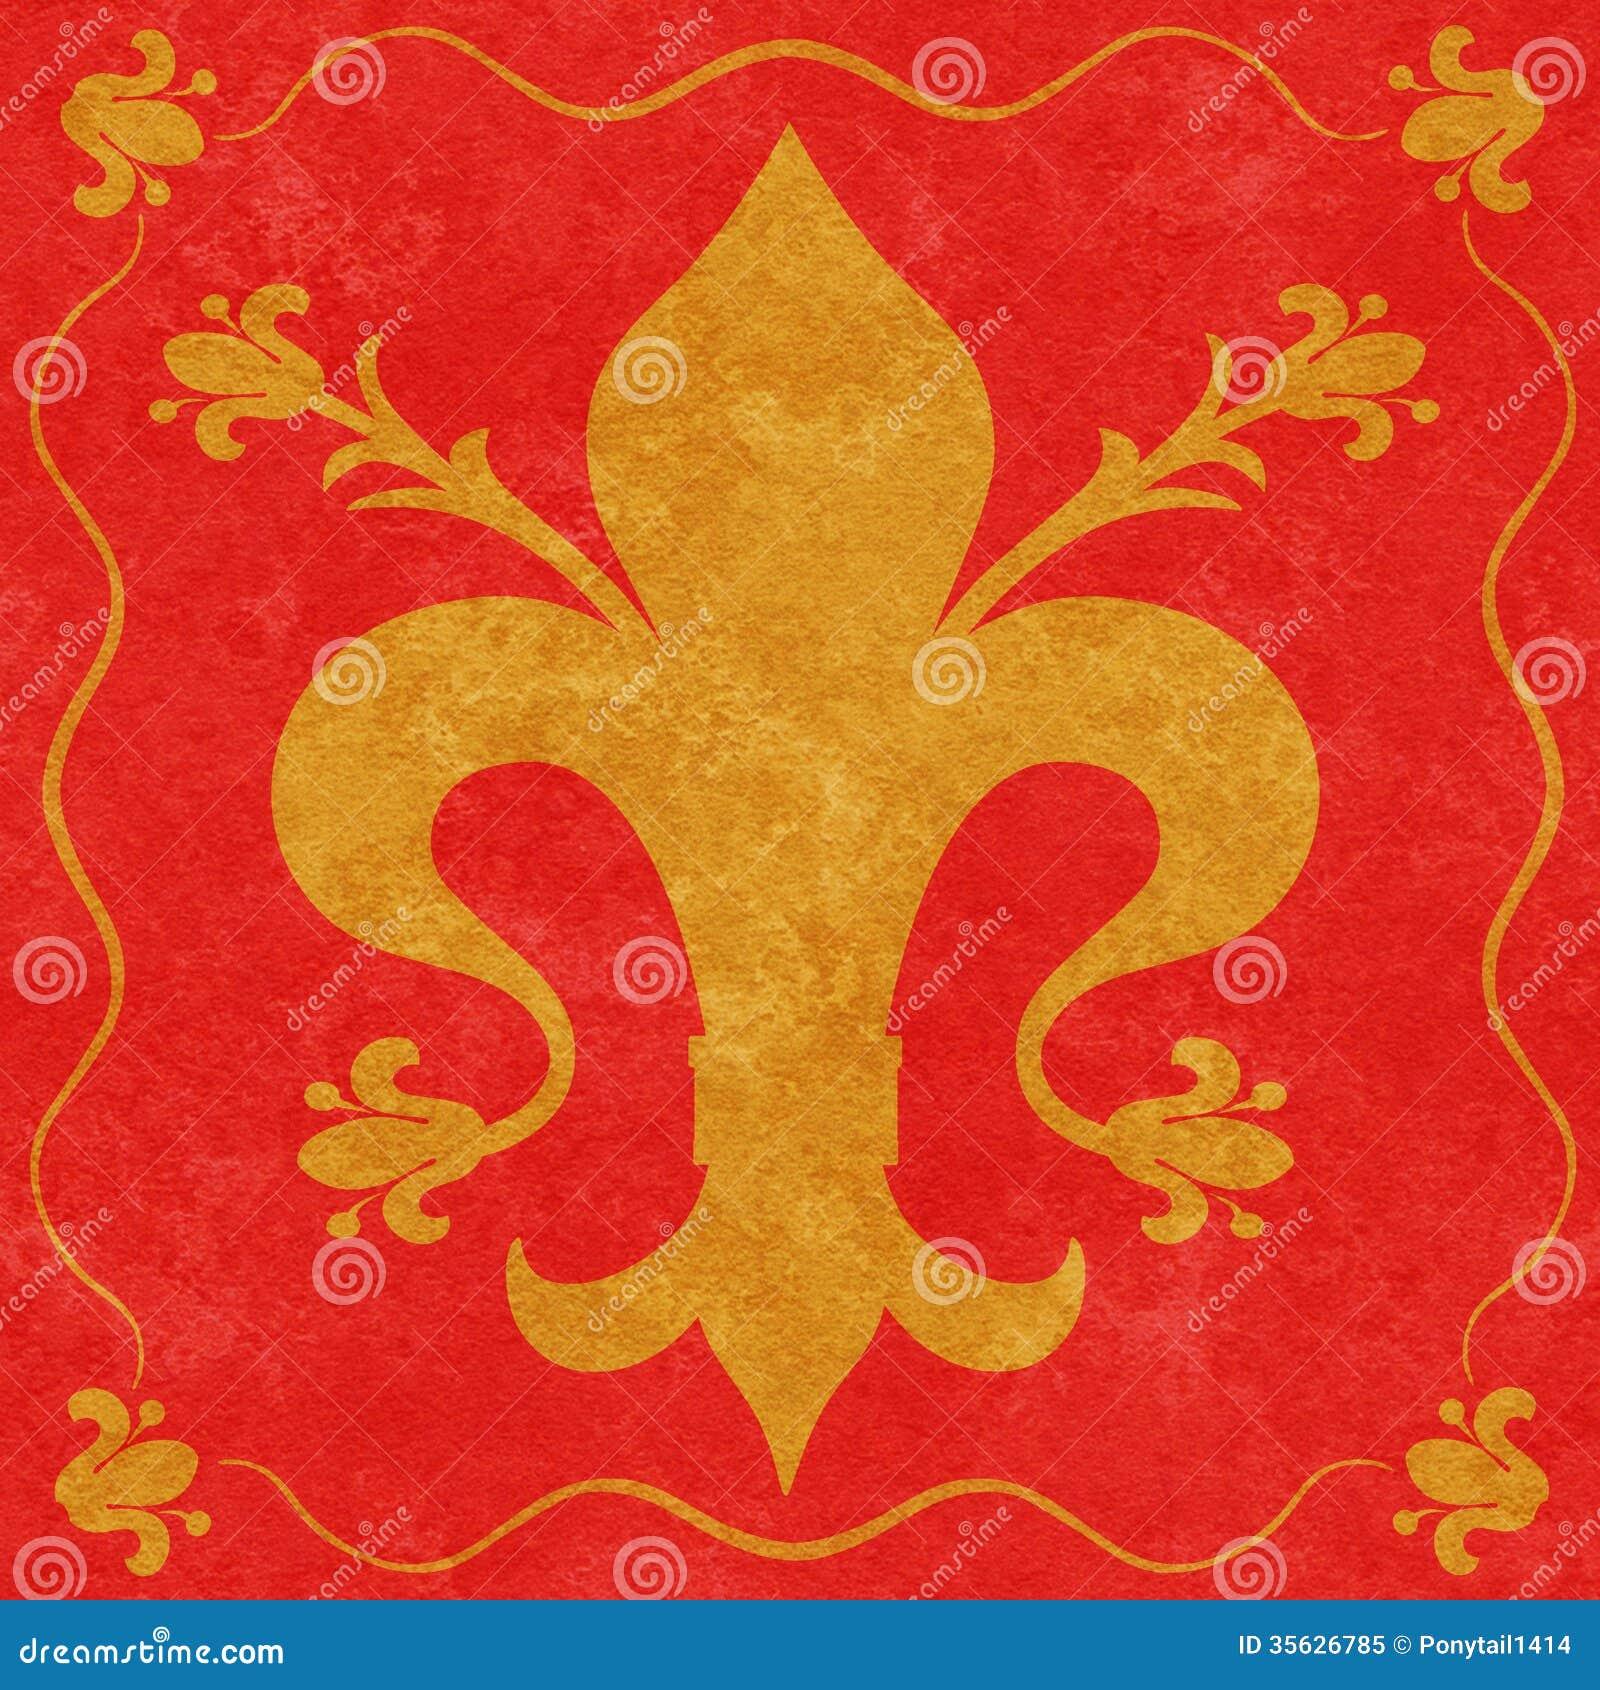 Gold Fleur De Lys On A Red Background Stock Illustration